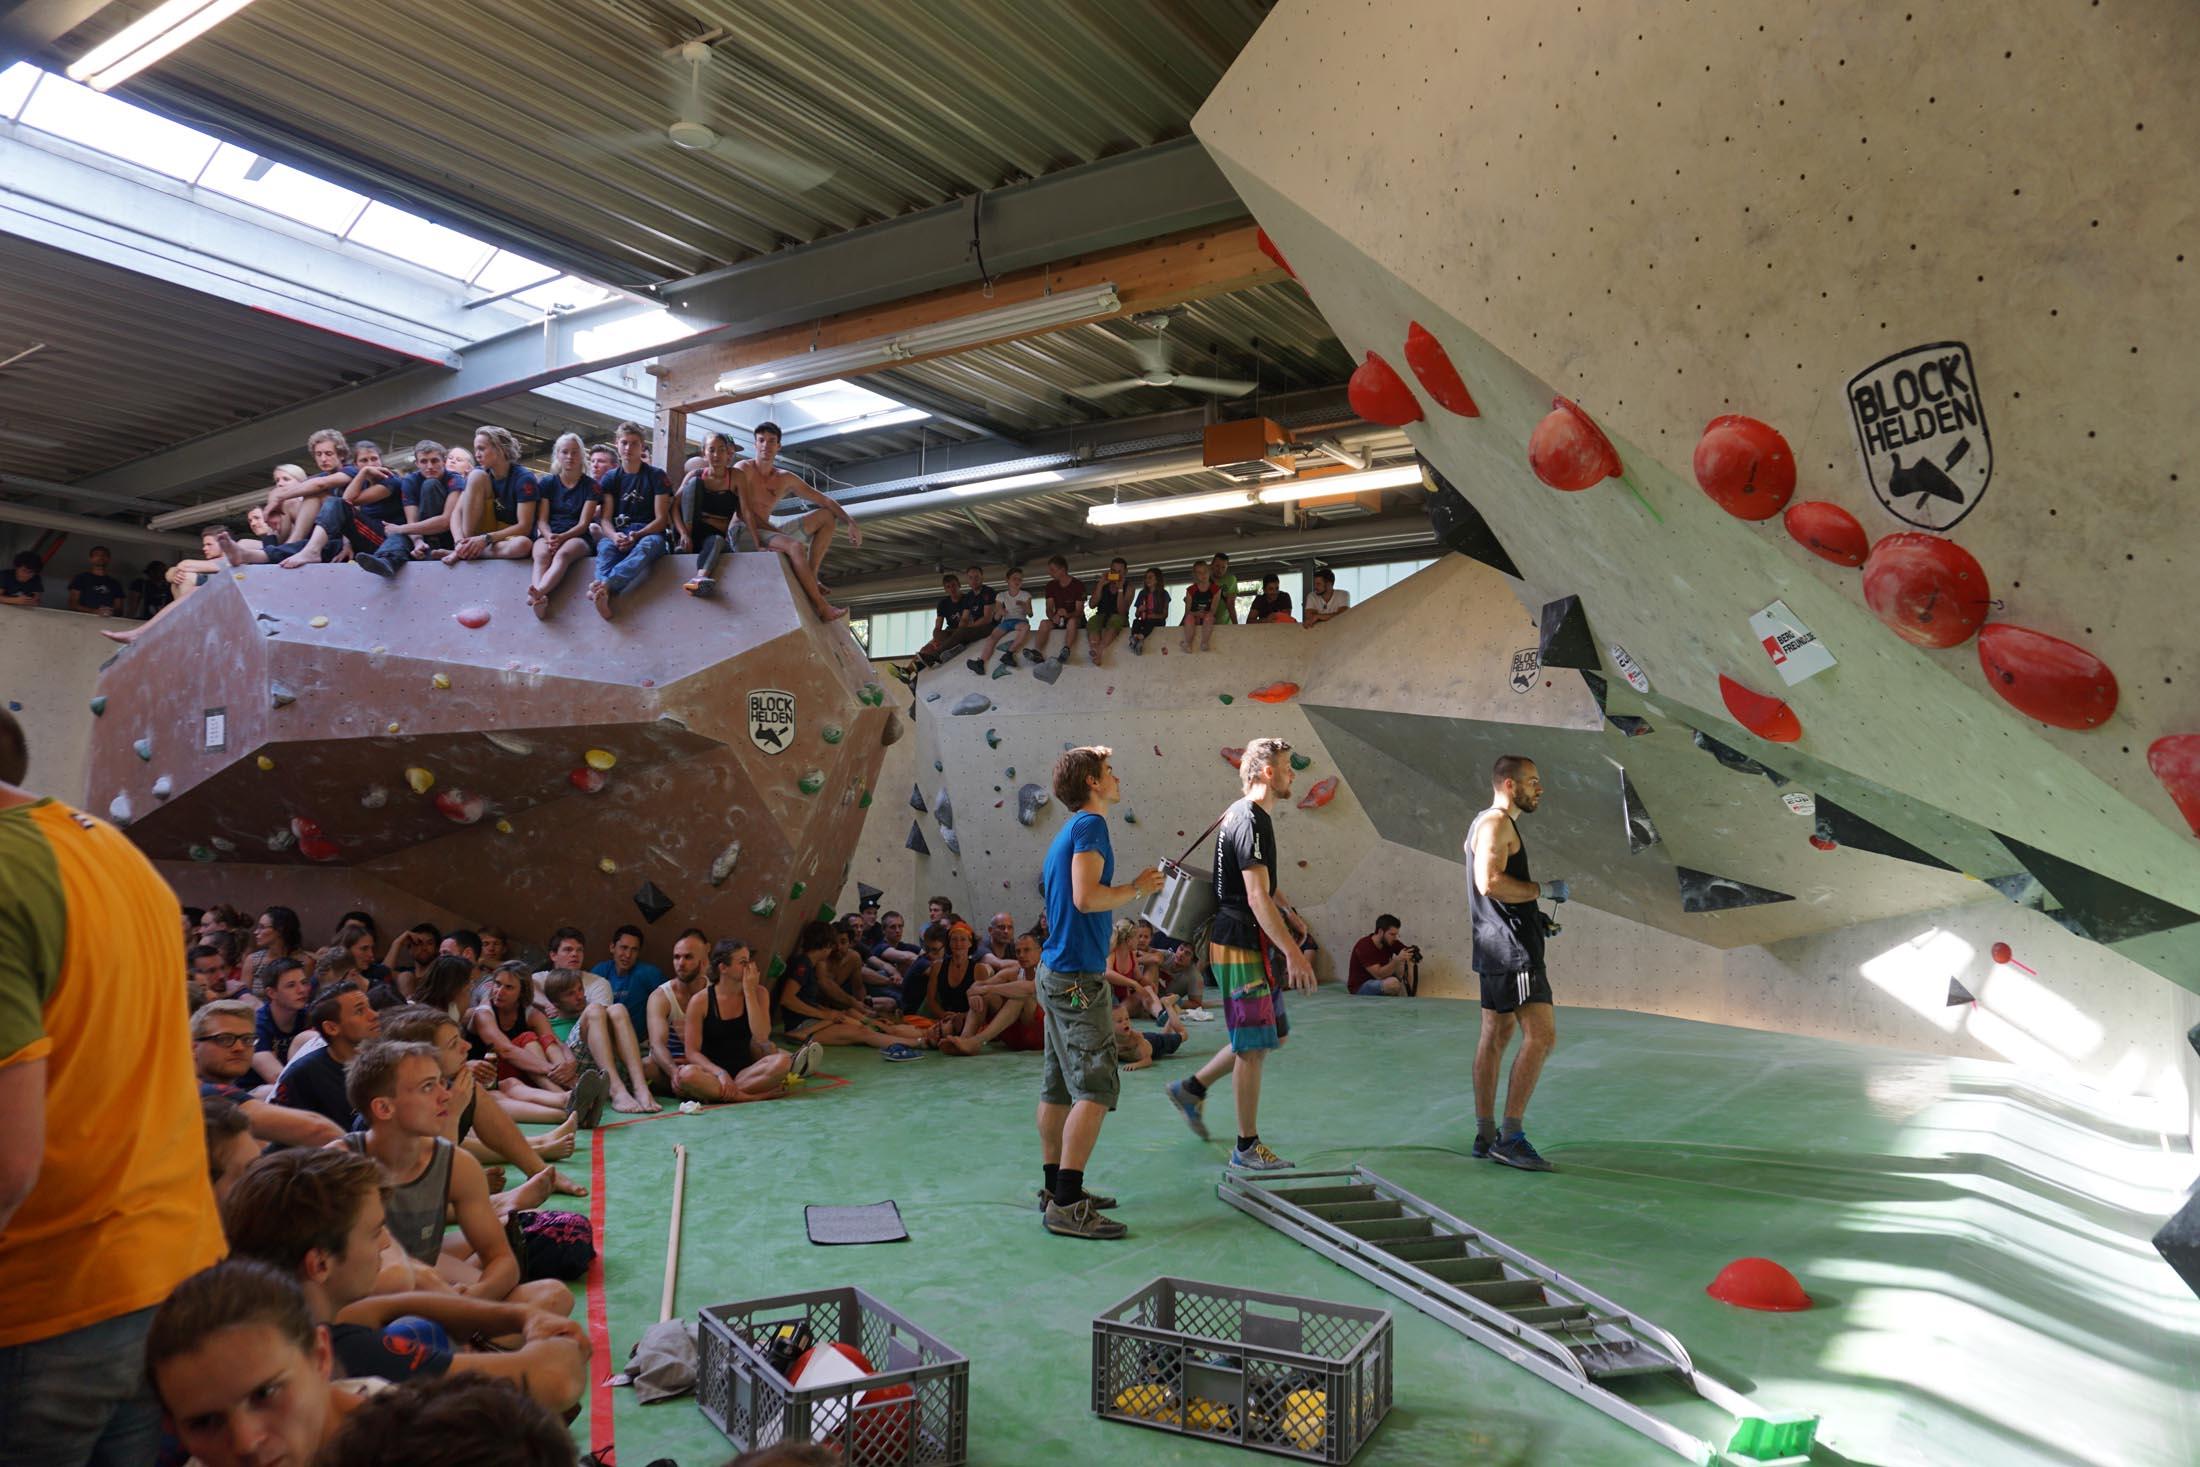 Quali, internationaler bouldercup Frankenjura 2016, BLOCKHELDEN Erlangen, Mammut, Bergfreunde.de, Boulderwettkampf07092016437